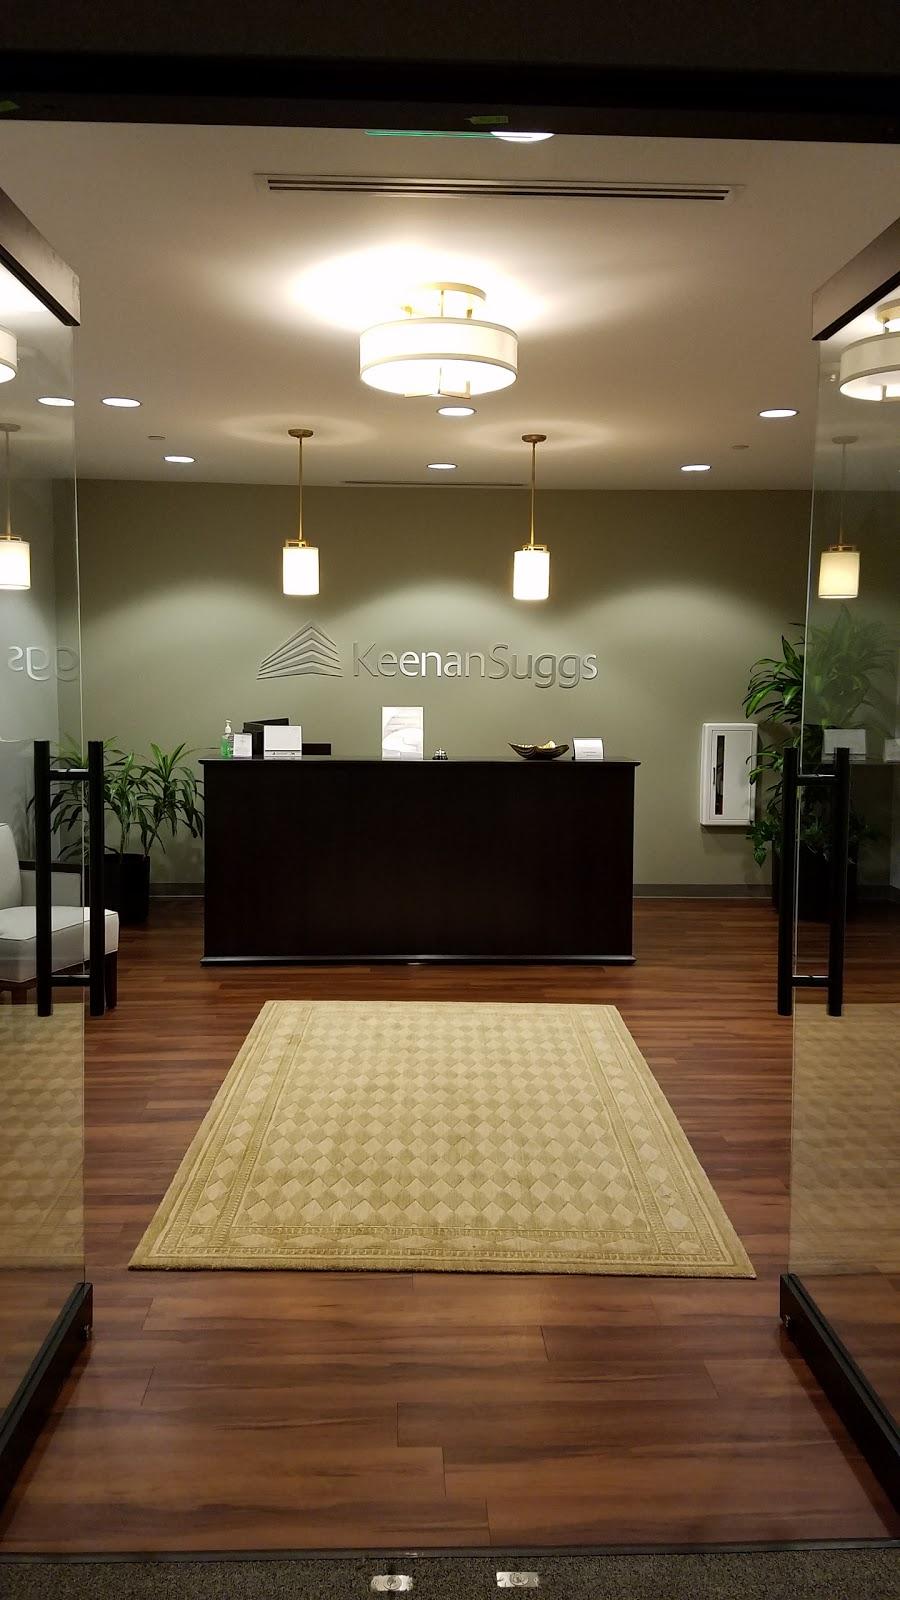 Keenan & Suggs |`HUB International Insurance